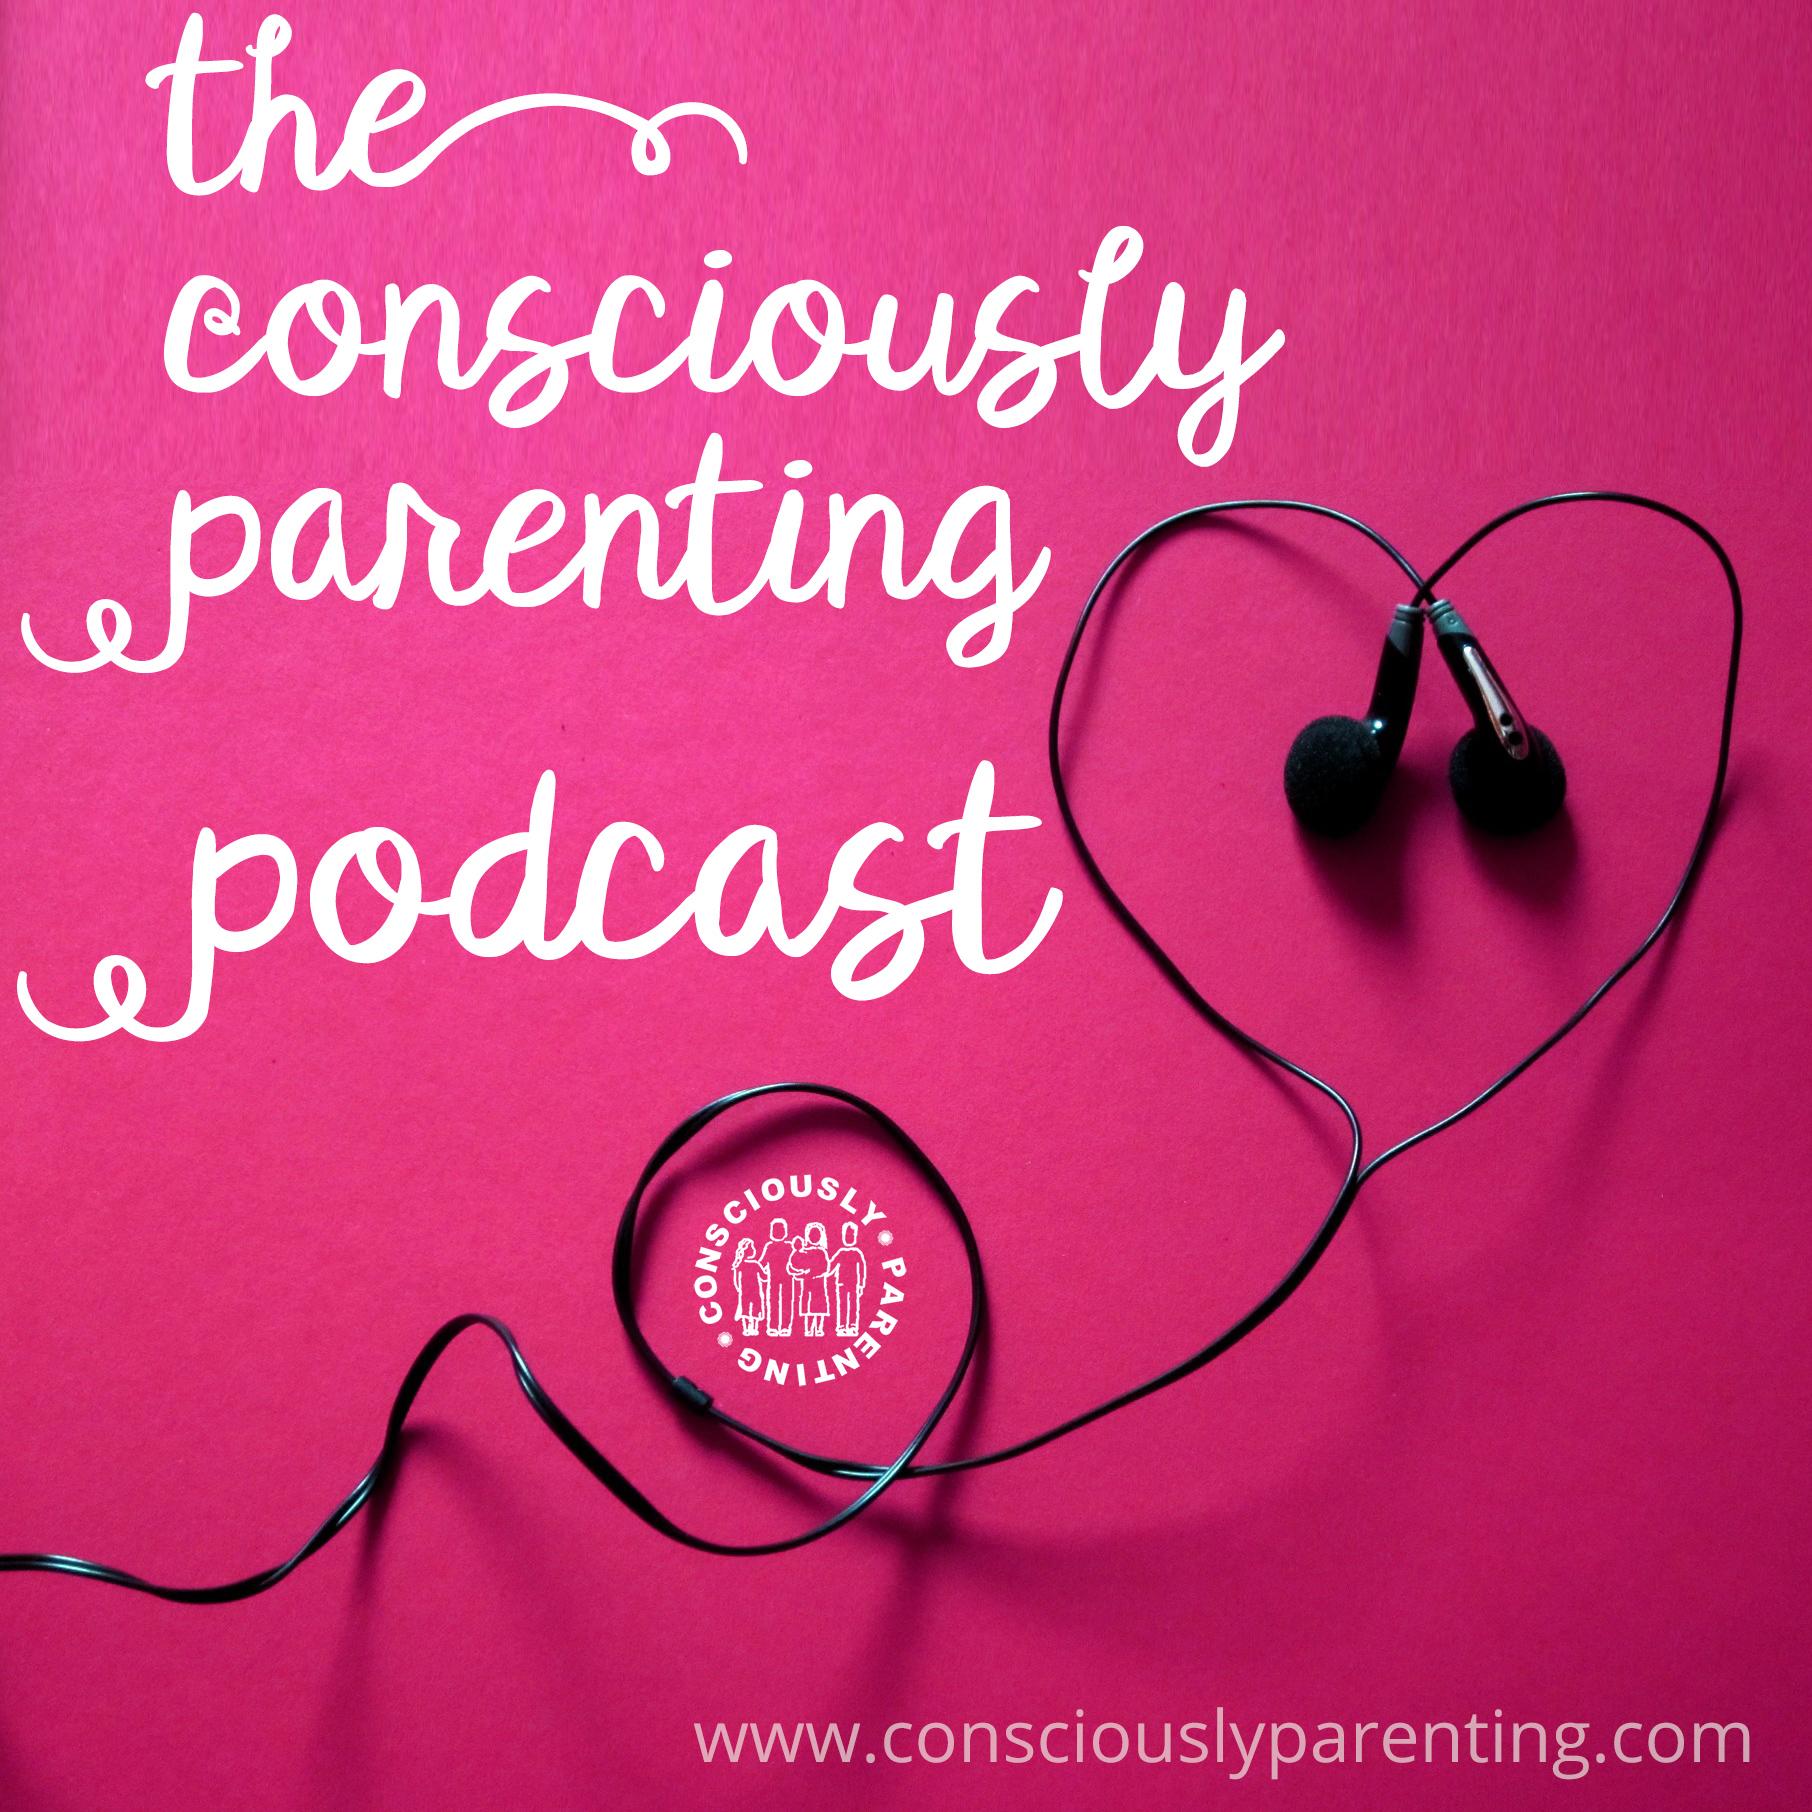 The Consciously Parenting Podcast show art